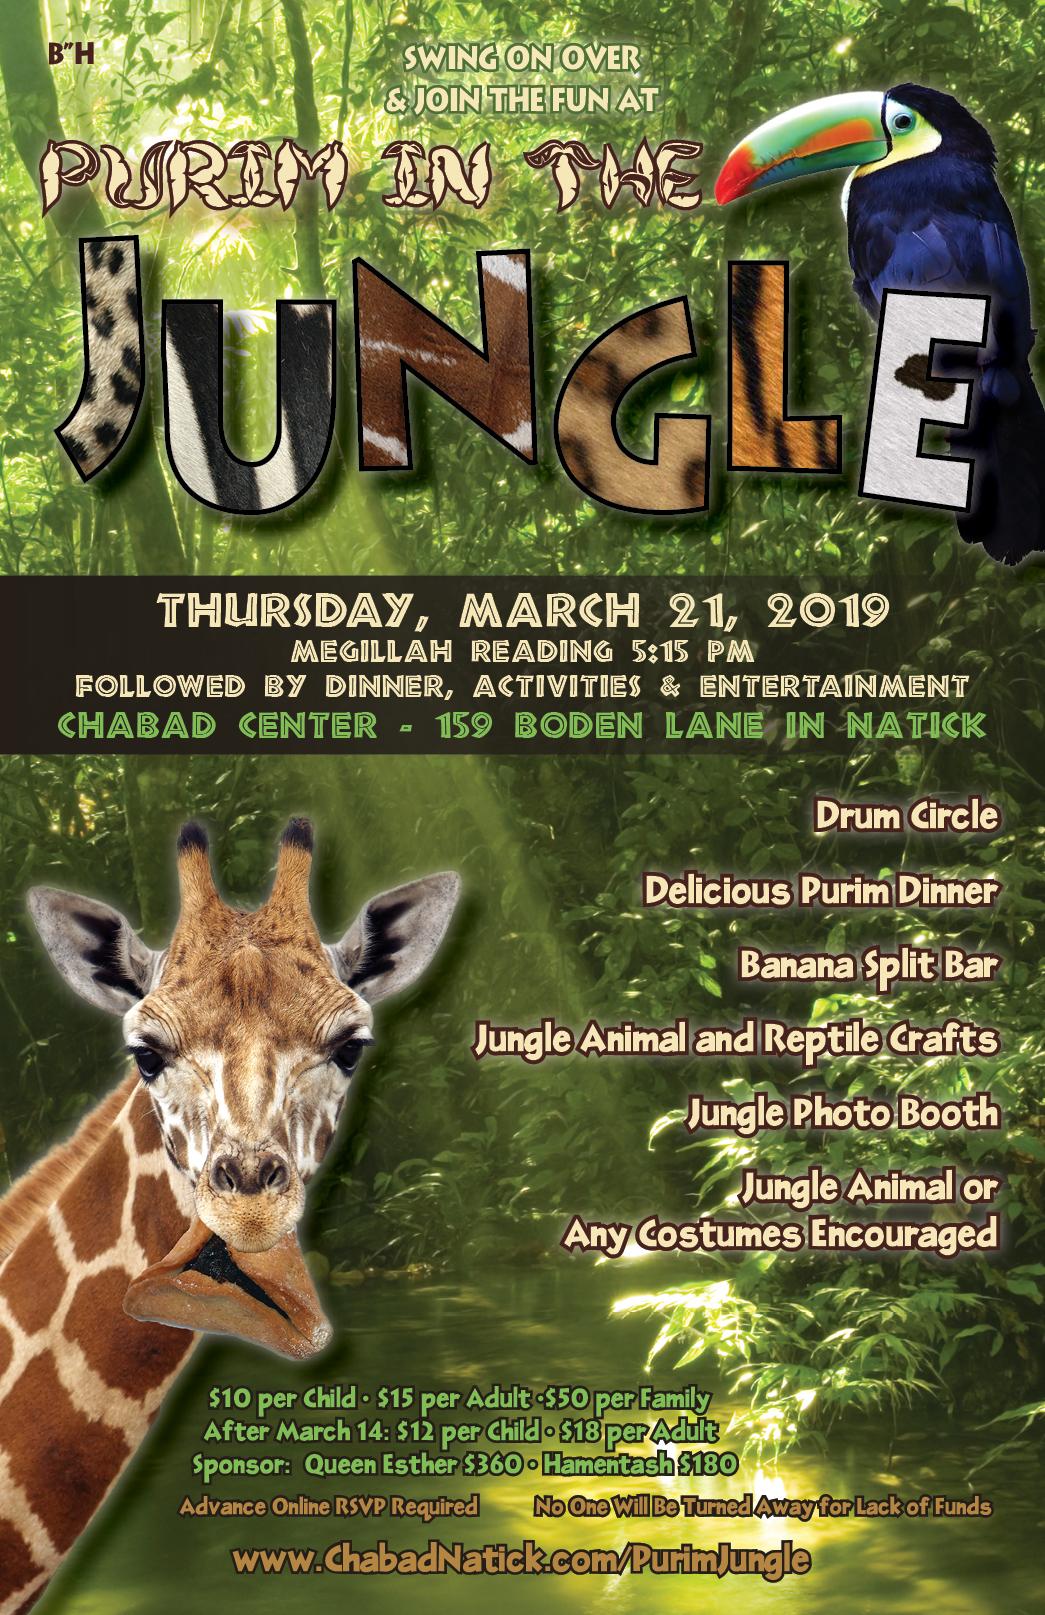 Purim Jungle 2019 draft 2 flyer.jpg